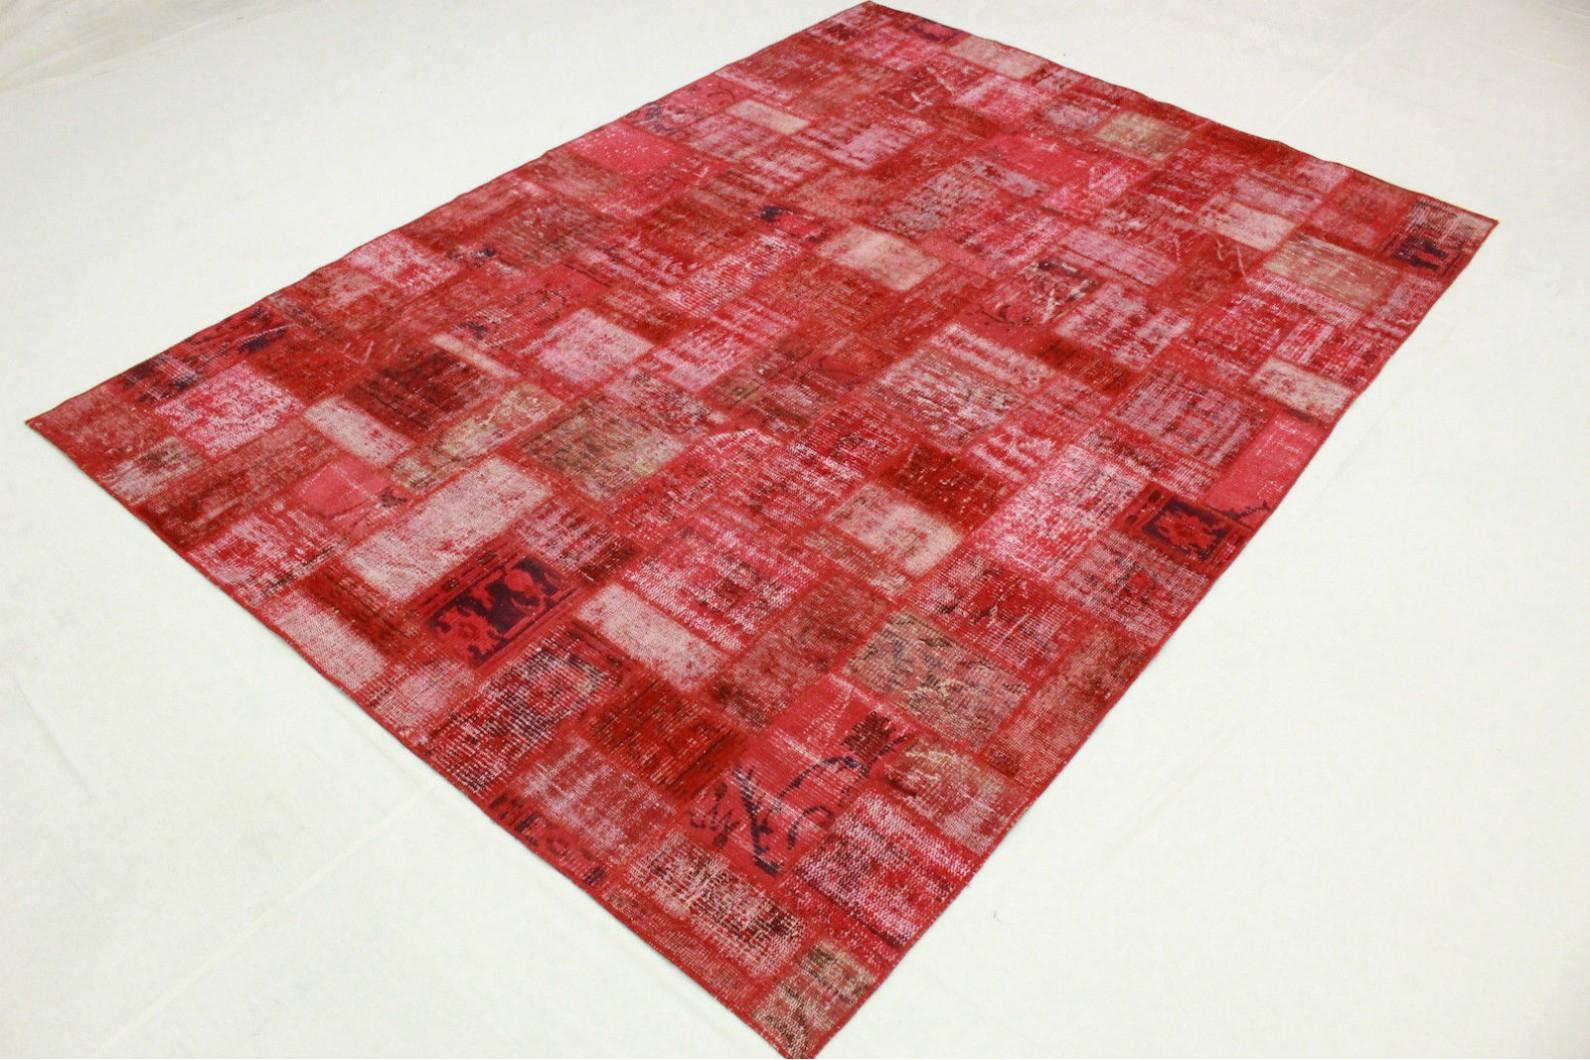 patchwork teppich rot in 300x210cm 1011 7504 bei kaufen. Black Bedroom Furniture Sets. Home Design Ideas